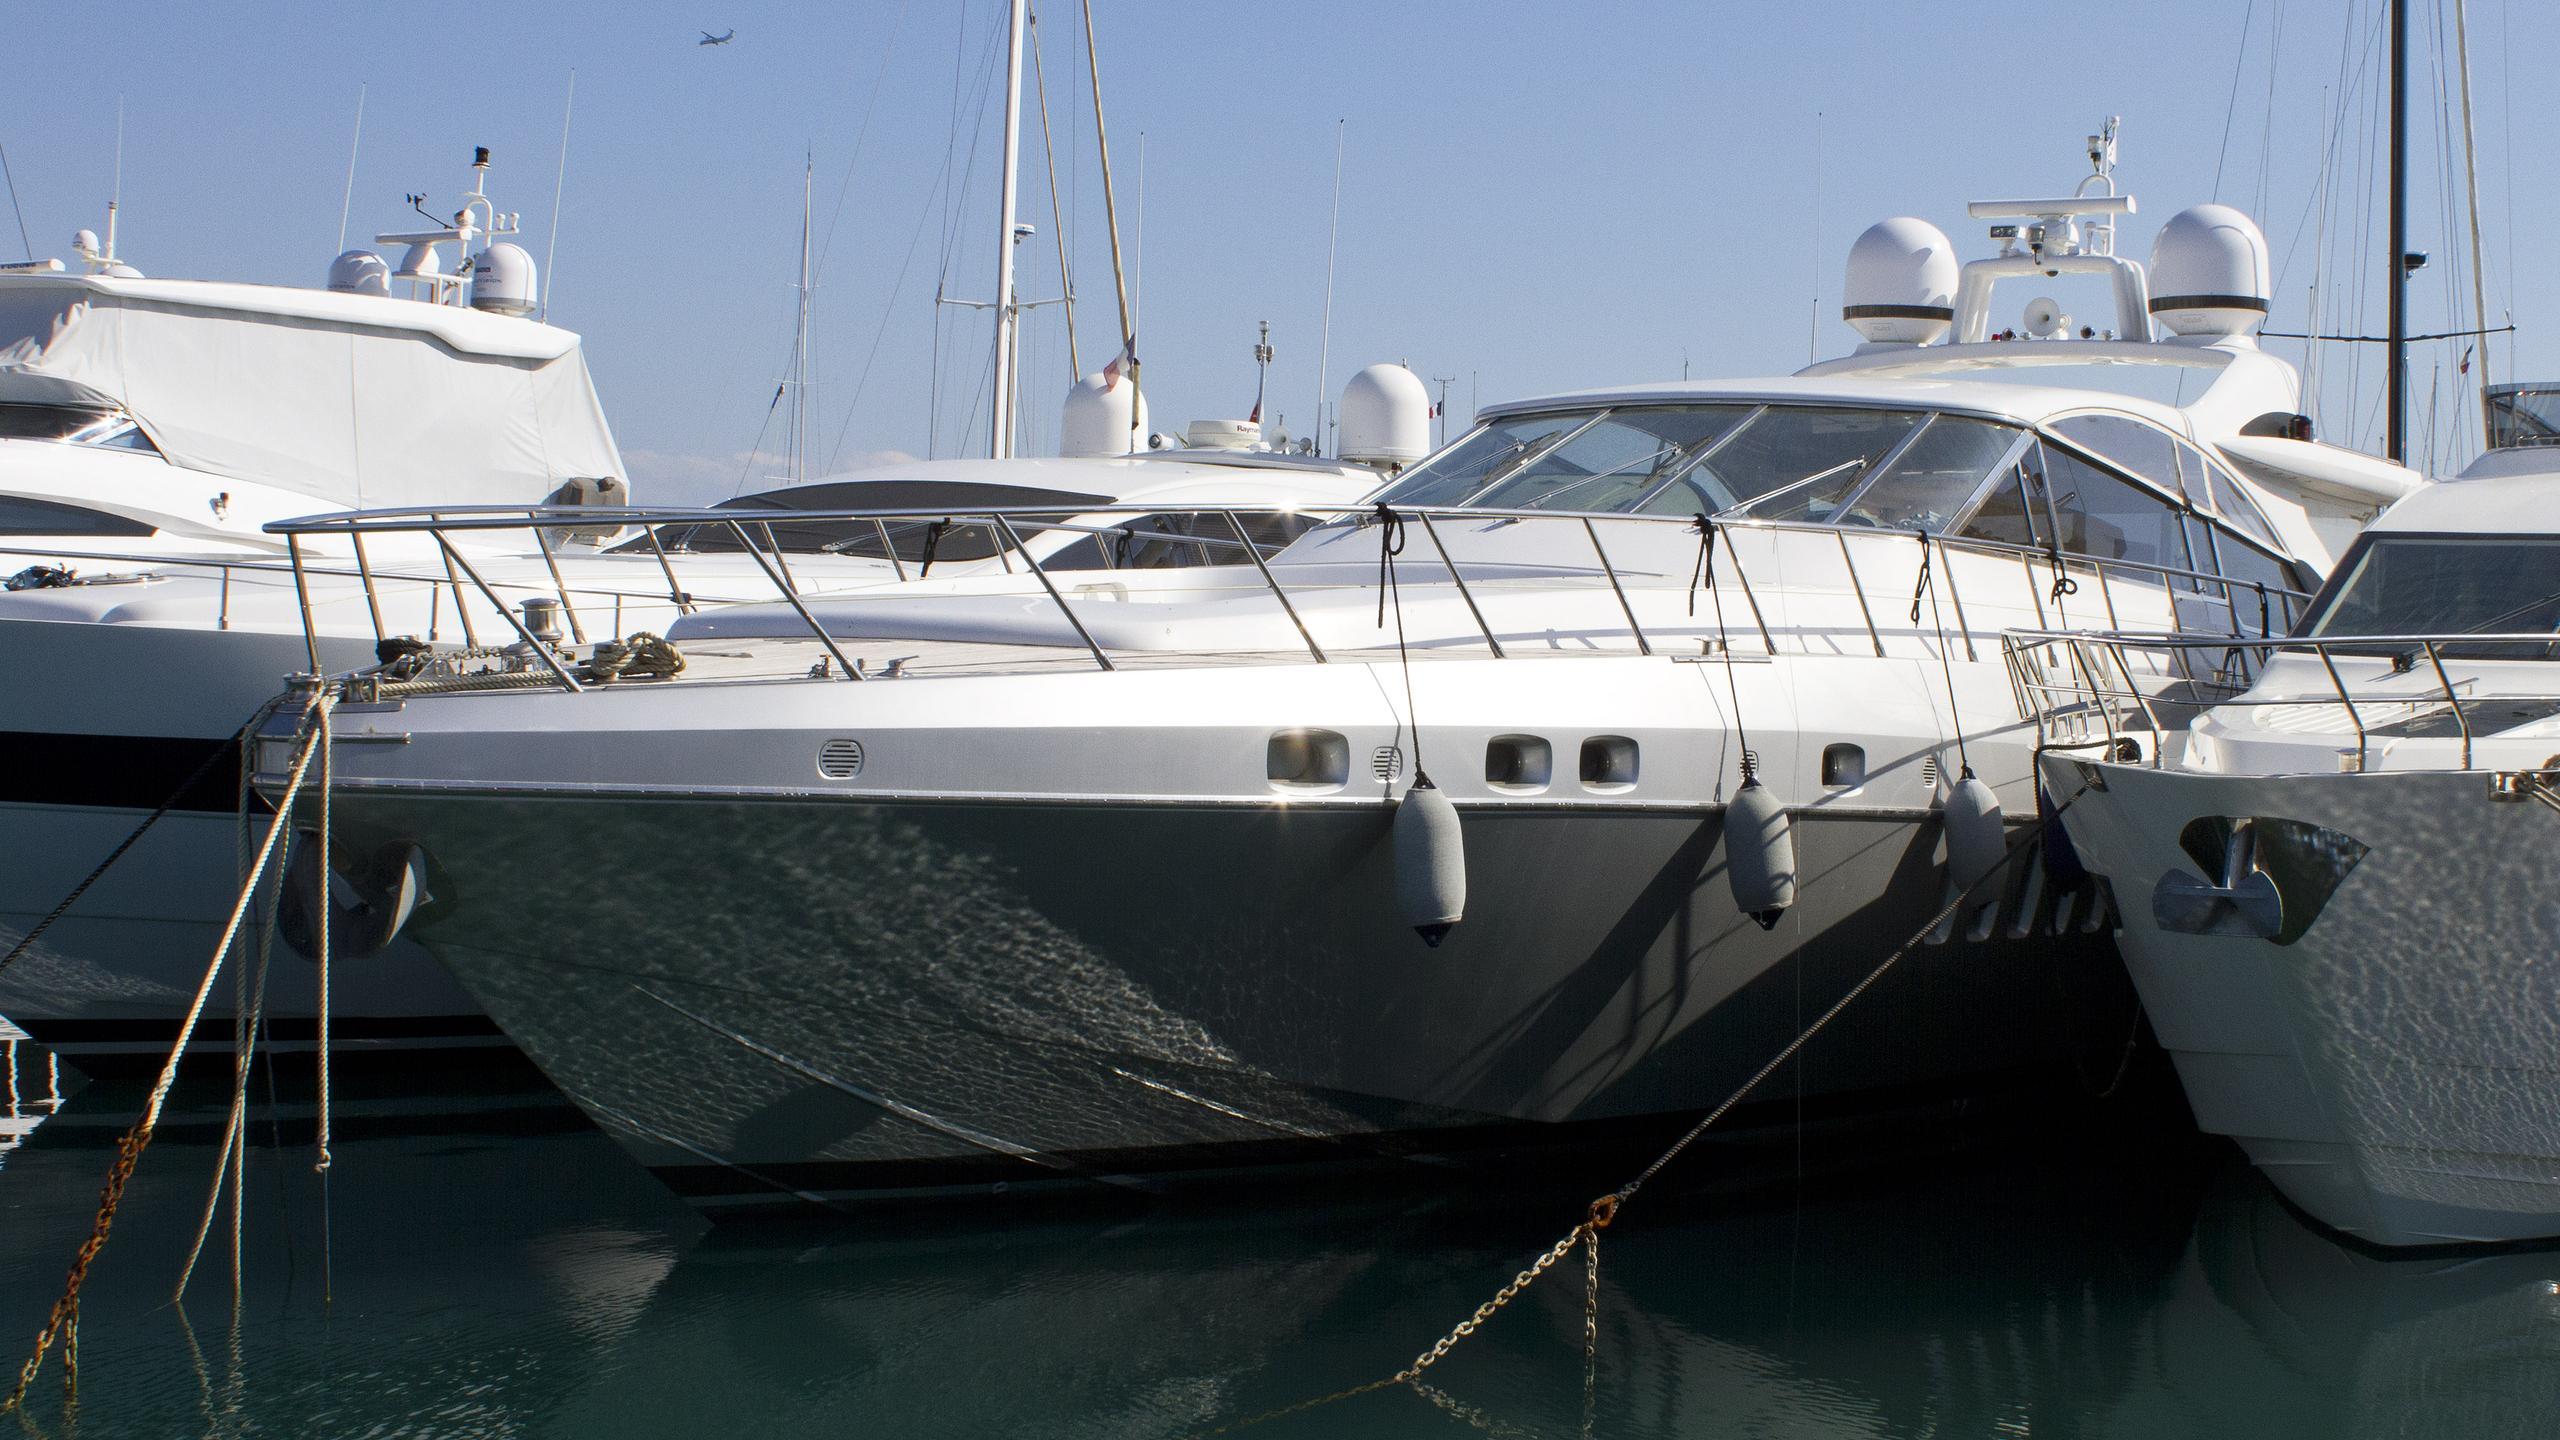 silver-sky-motor-yacht-overmarine-mangusta-80-ipen-ht-2006-25m-bow-profile